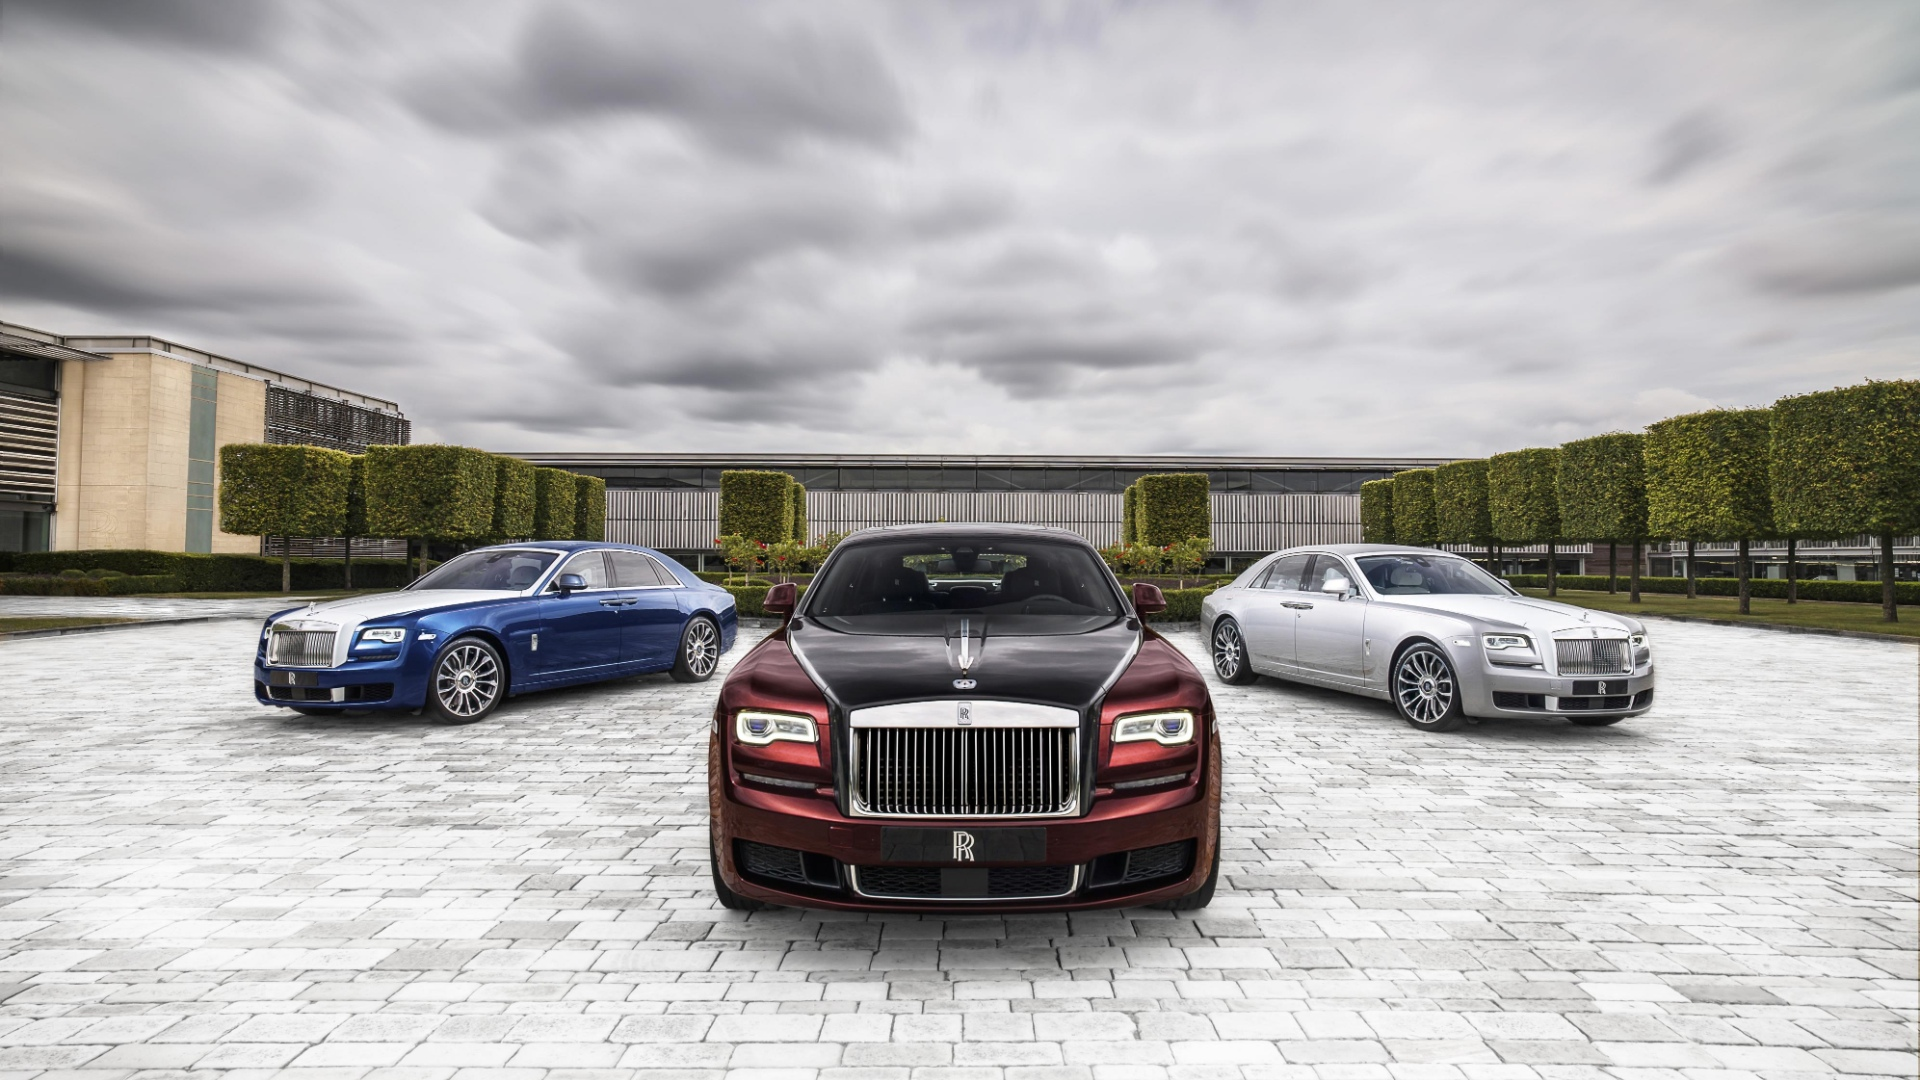 2019 Full Year Global Rolls Royce Sales Worldwide Car Sales Statistics